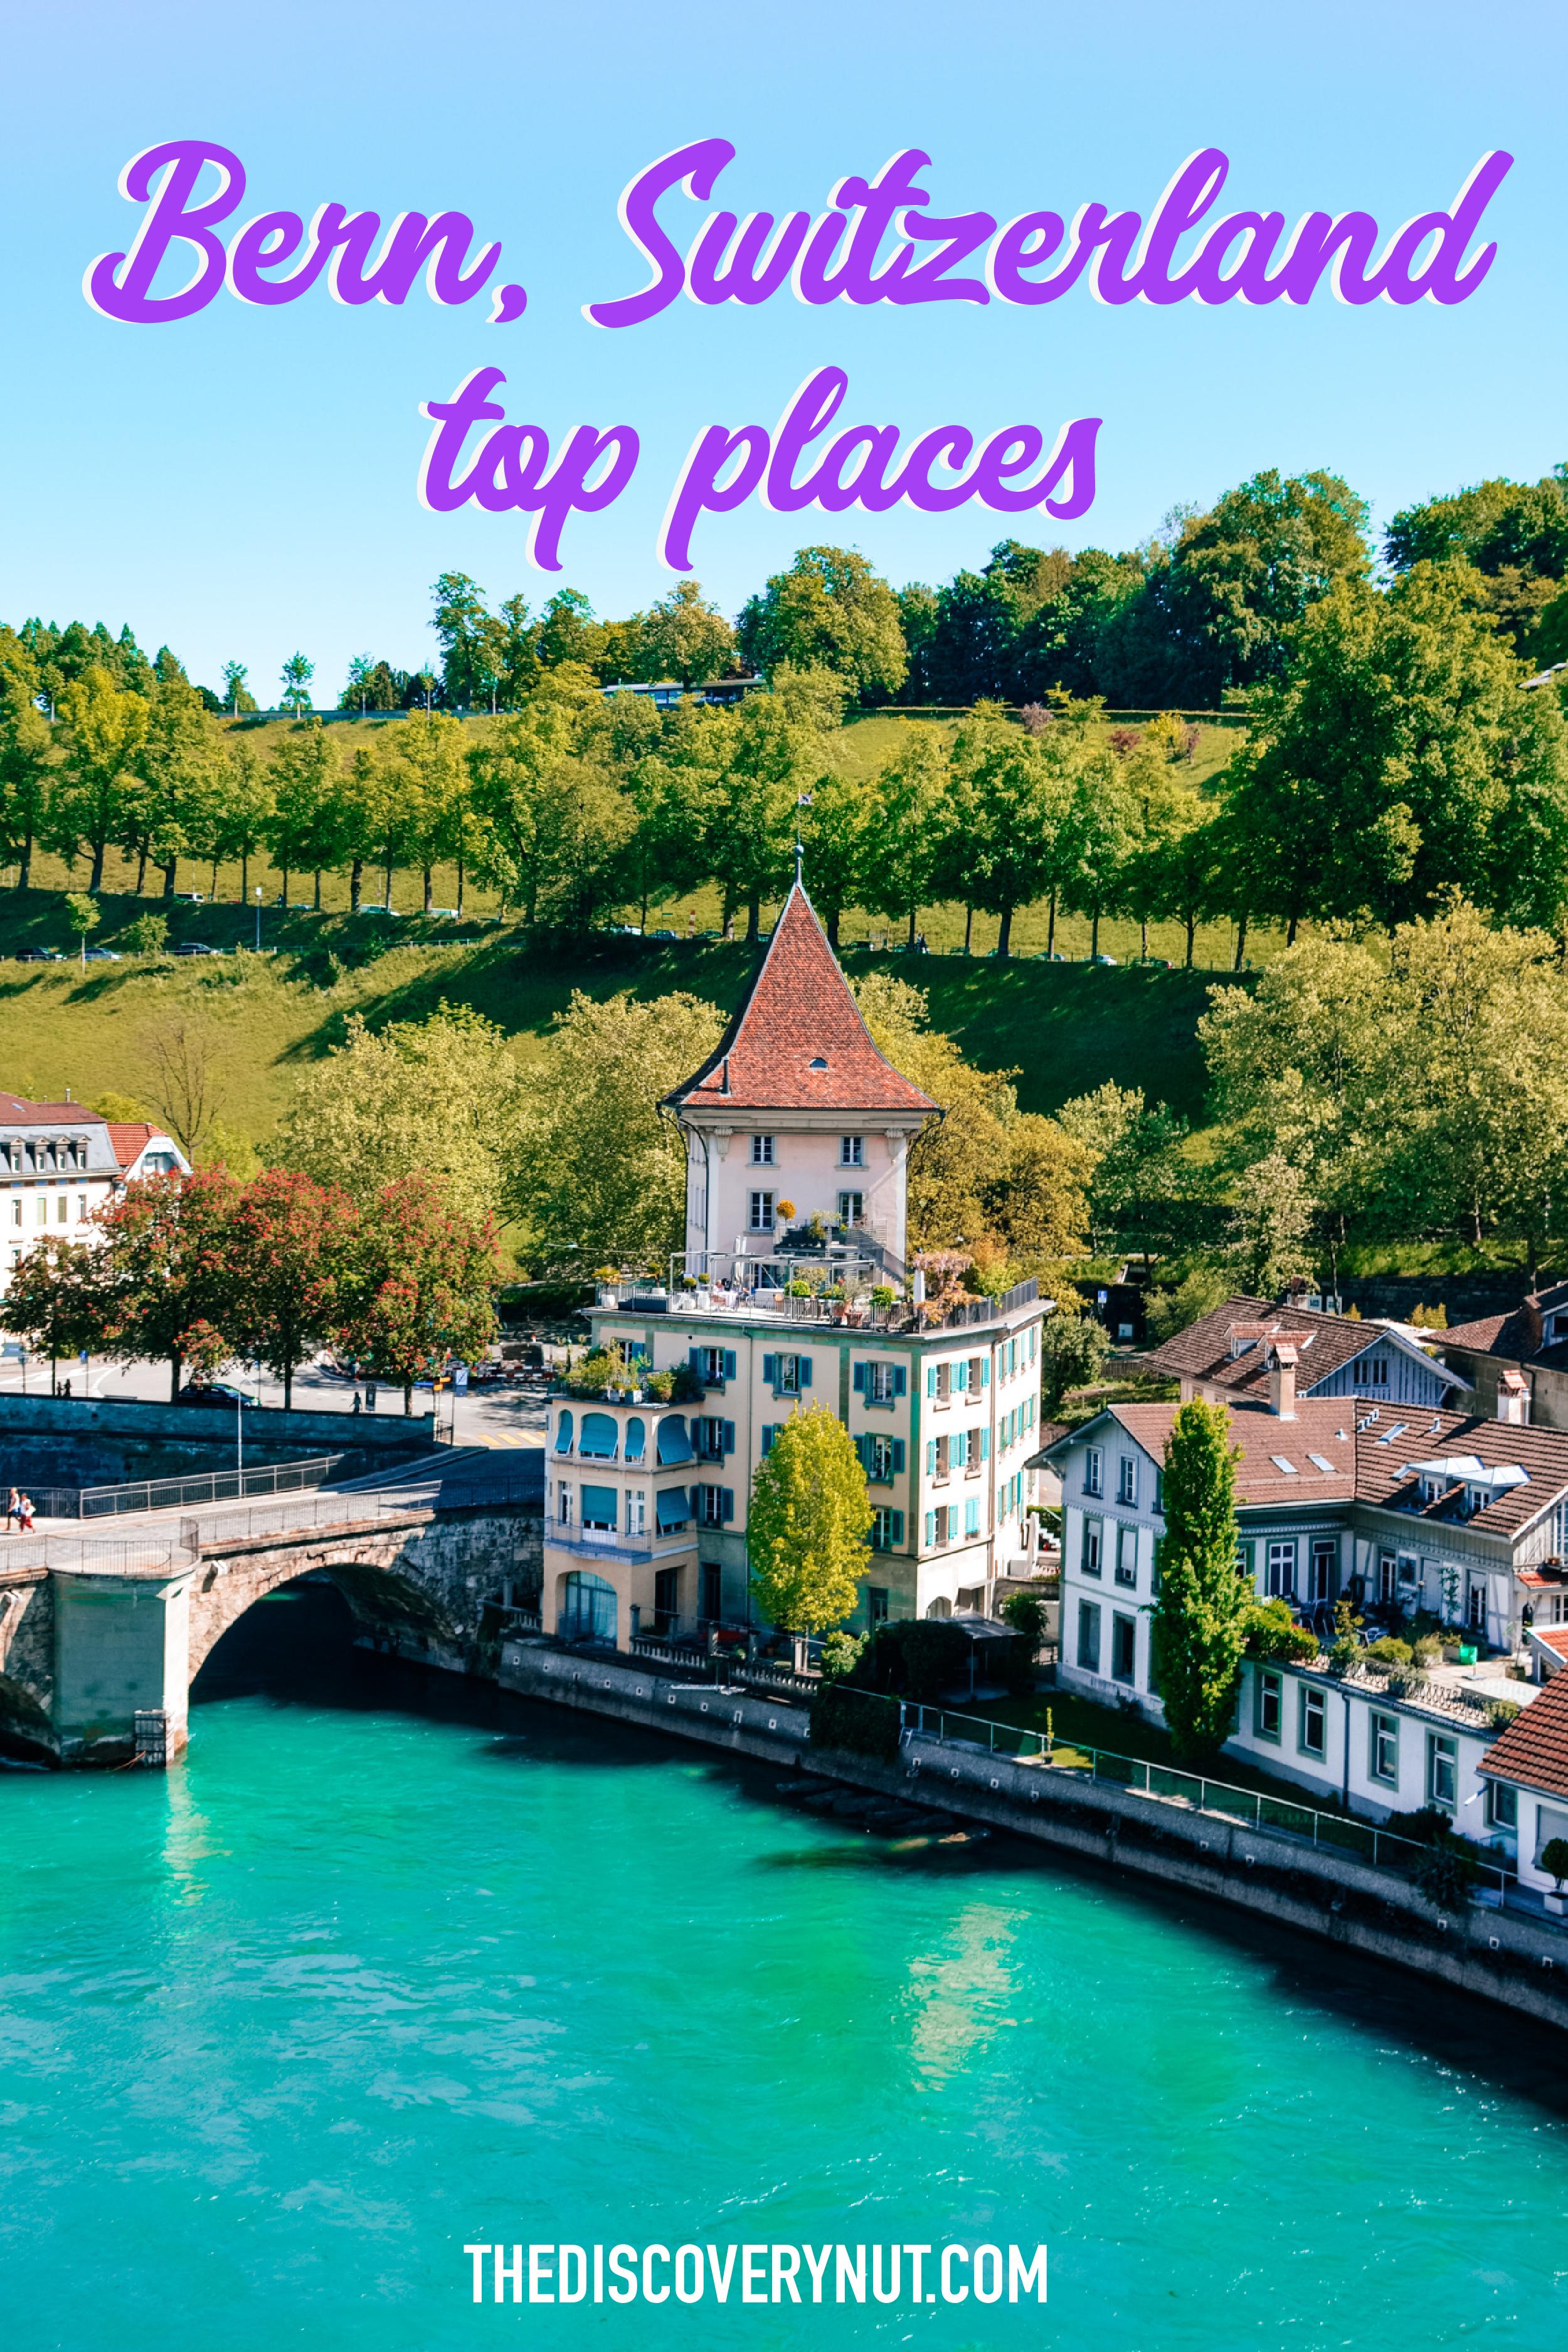 Best things to do in Bern, Switzerland